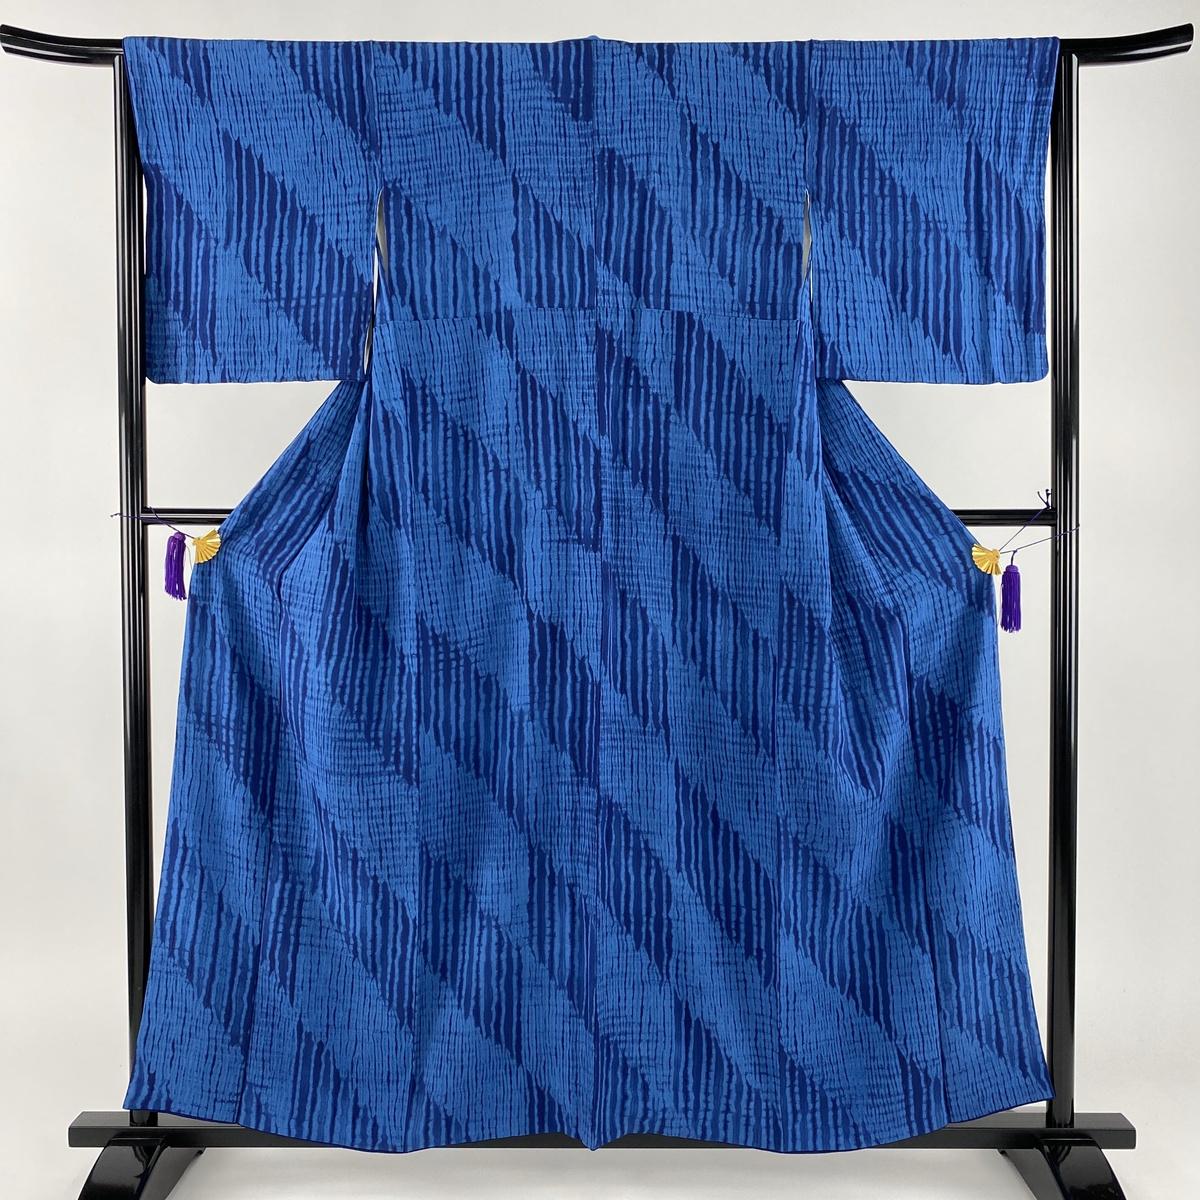 小紋 美品 名品 幾何学模様 縫い締め絞り 藍色 袷 身丈157.5cm 裄丈63cm S 正絹 【中古】